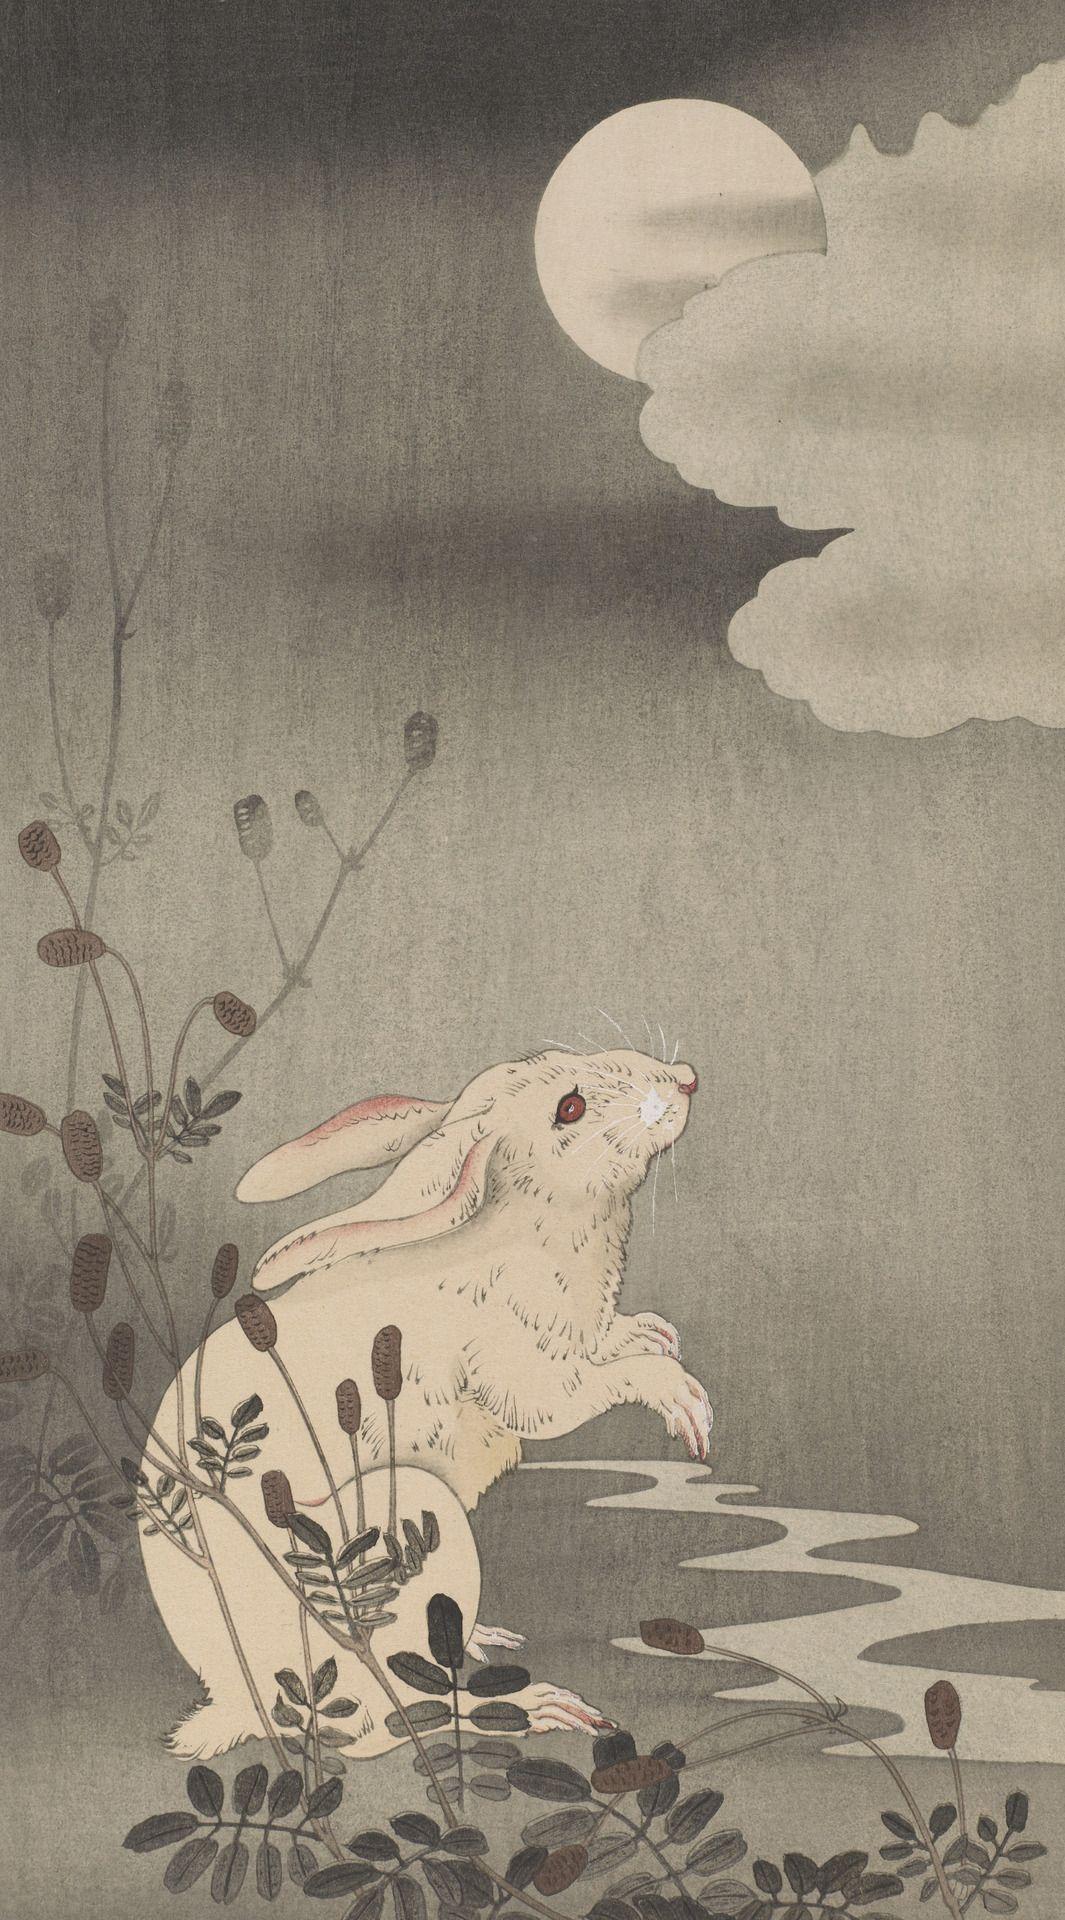 Full Size of Bullfrog Lulu Sofa Preis Ohara Koson Rabbit In Moonlight 1910 Via Freer Sackler Wohnzimmer Bullfrog Lulu